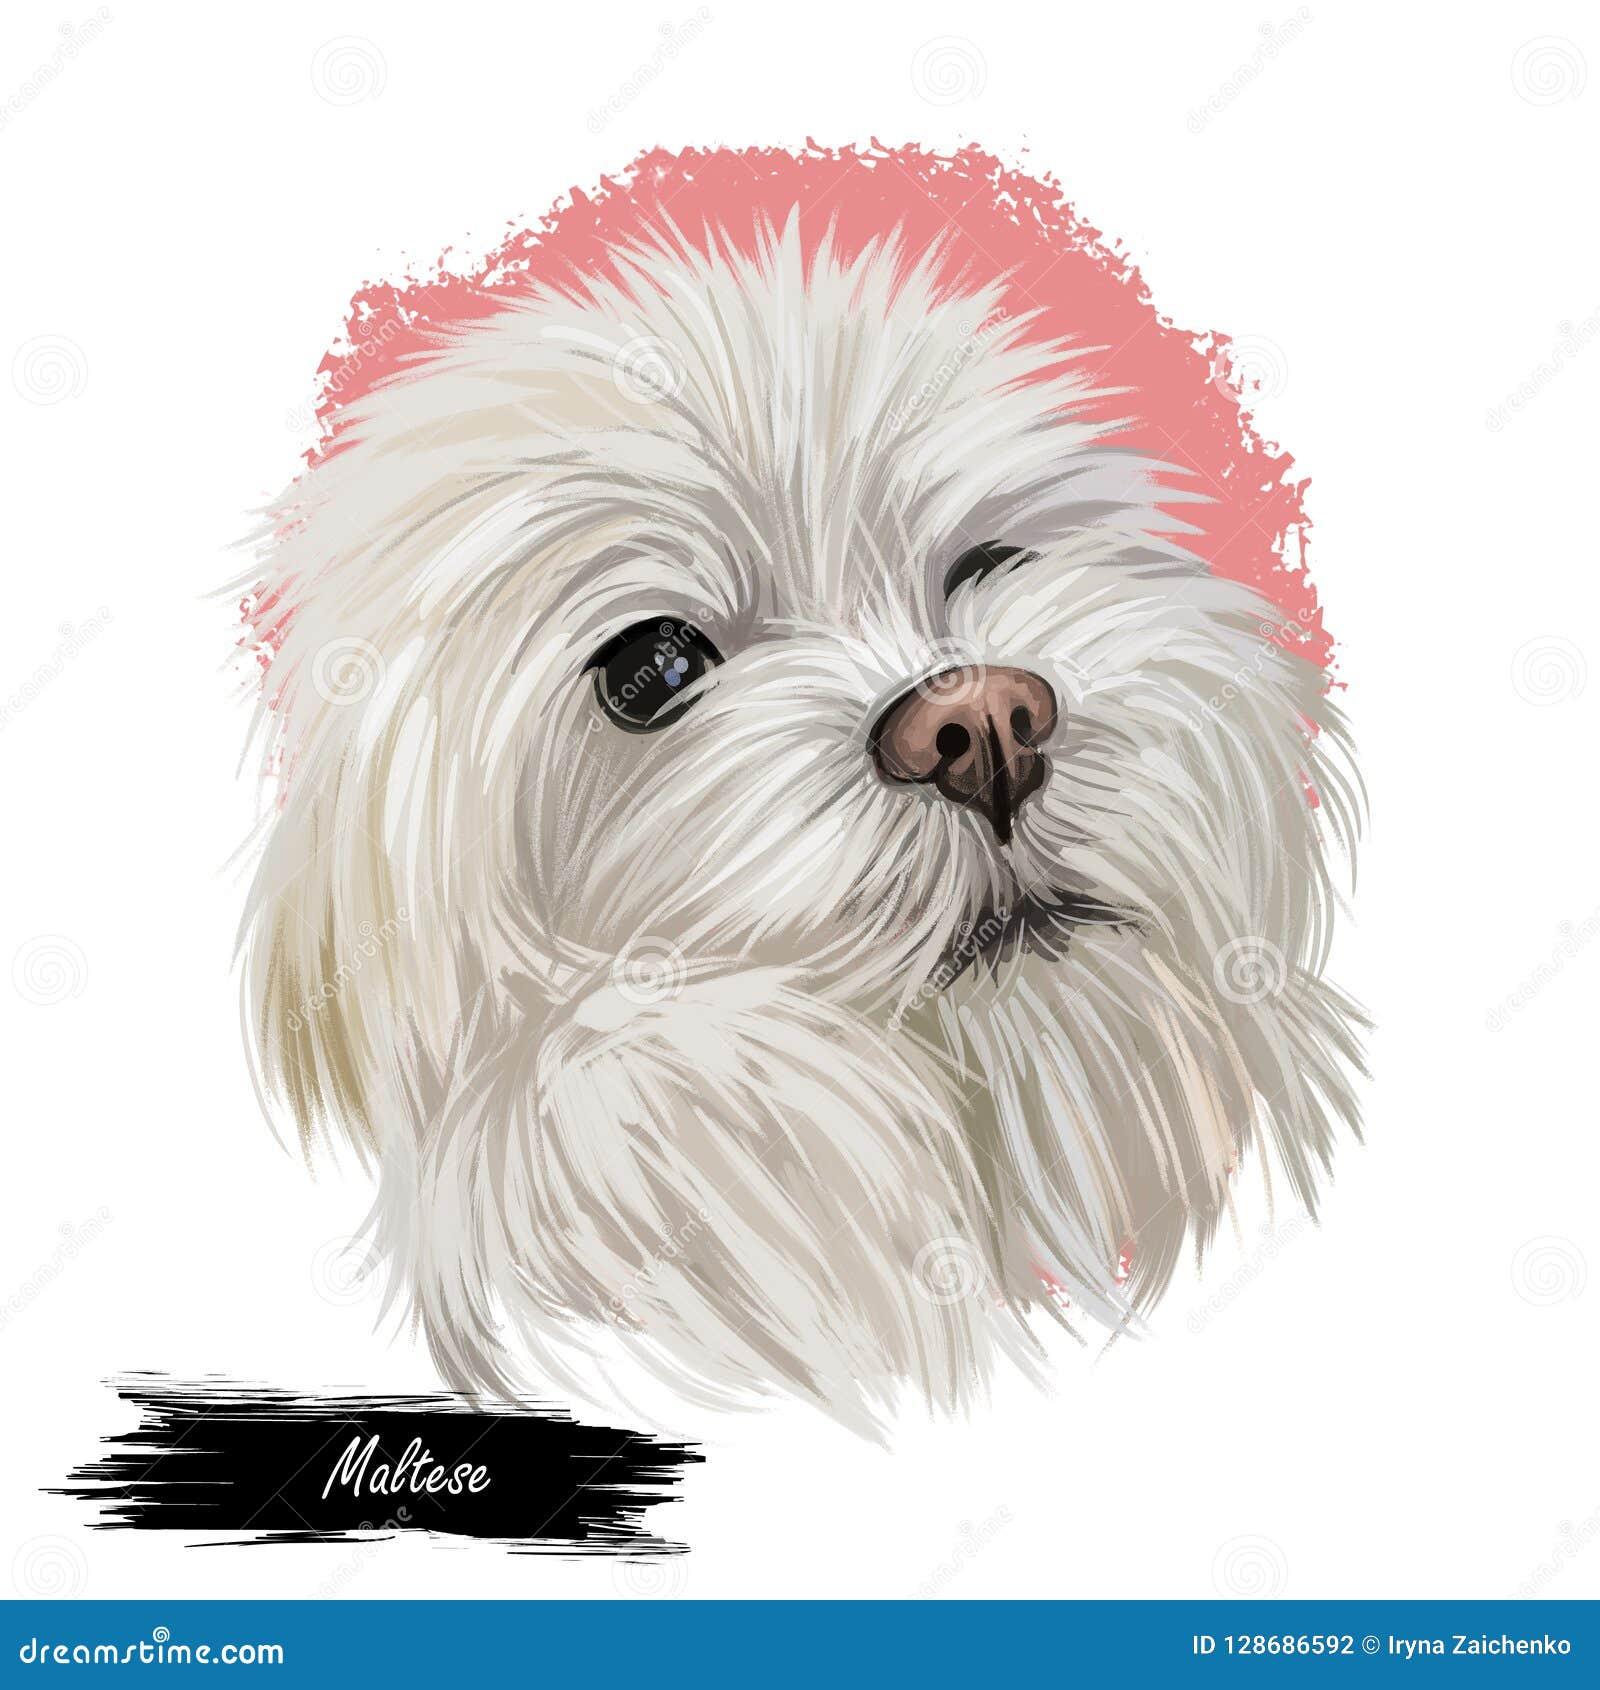 Maelitacus Maltese Di Canis Familiaris Illustrazione Digitale Di